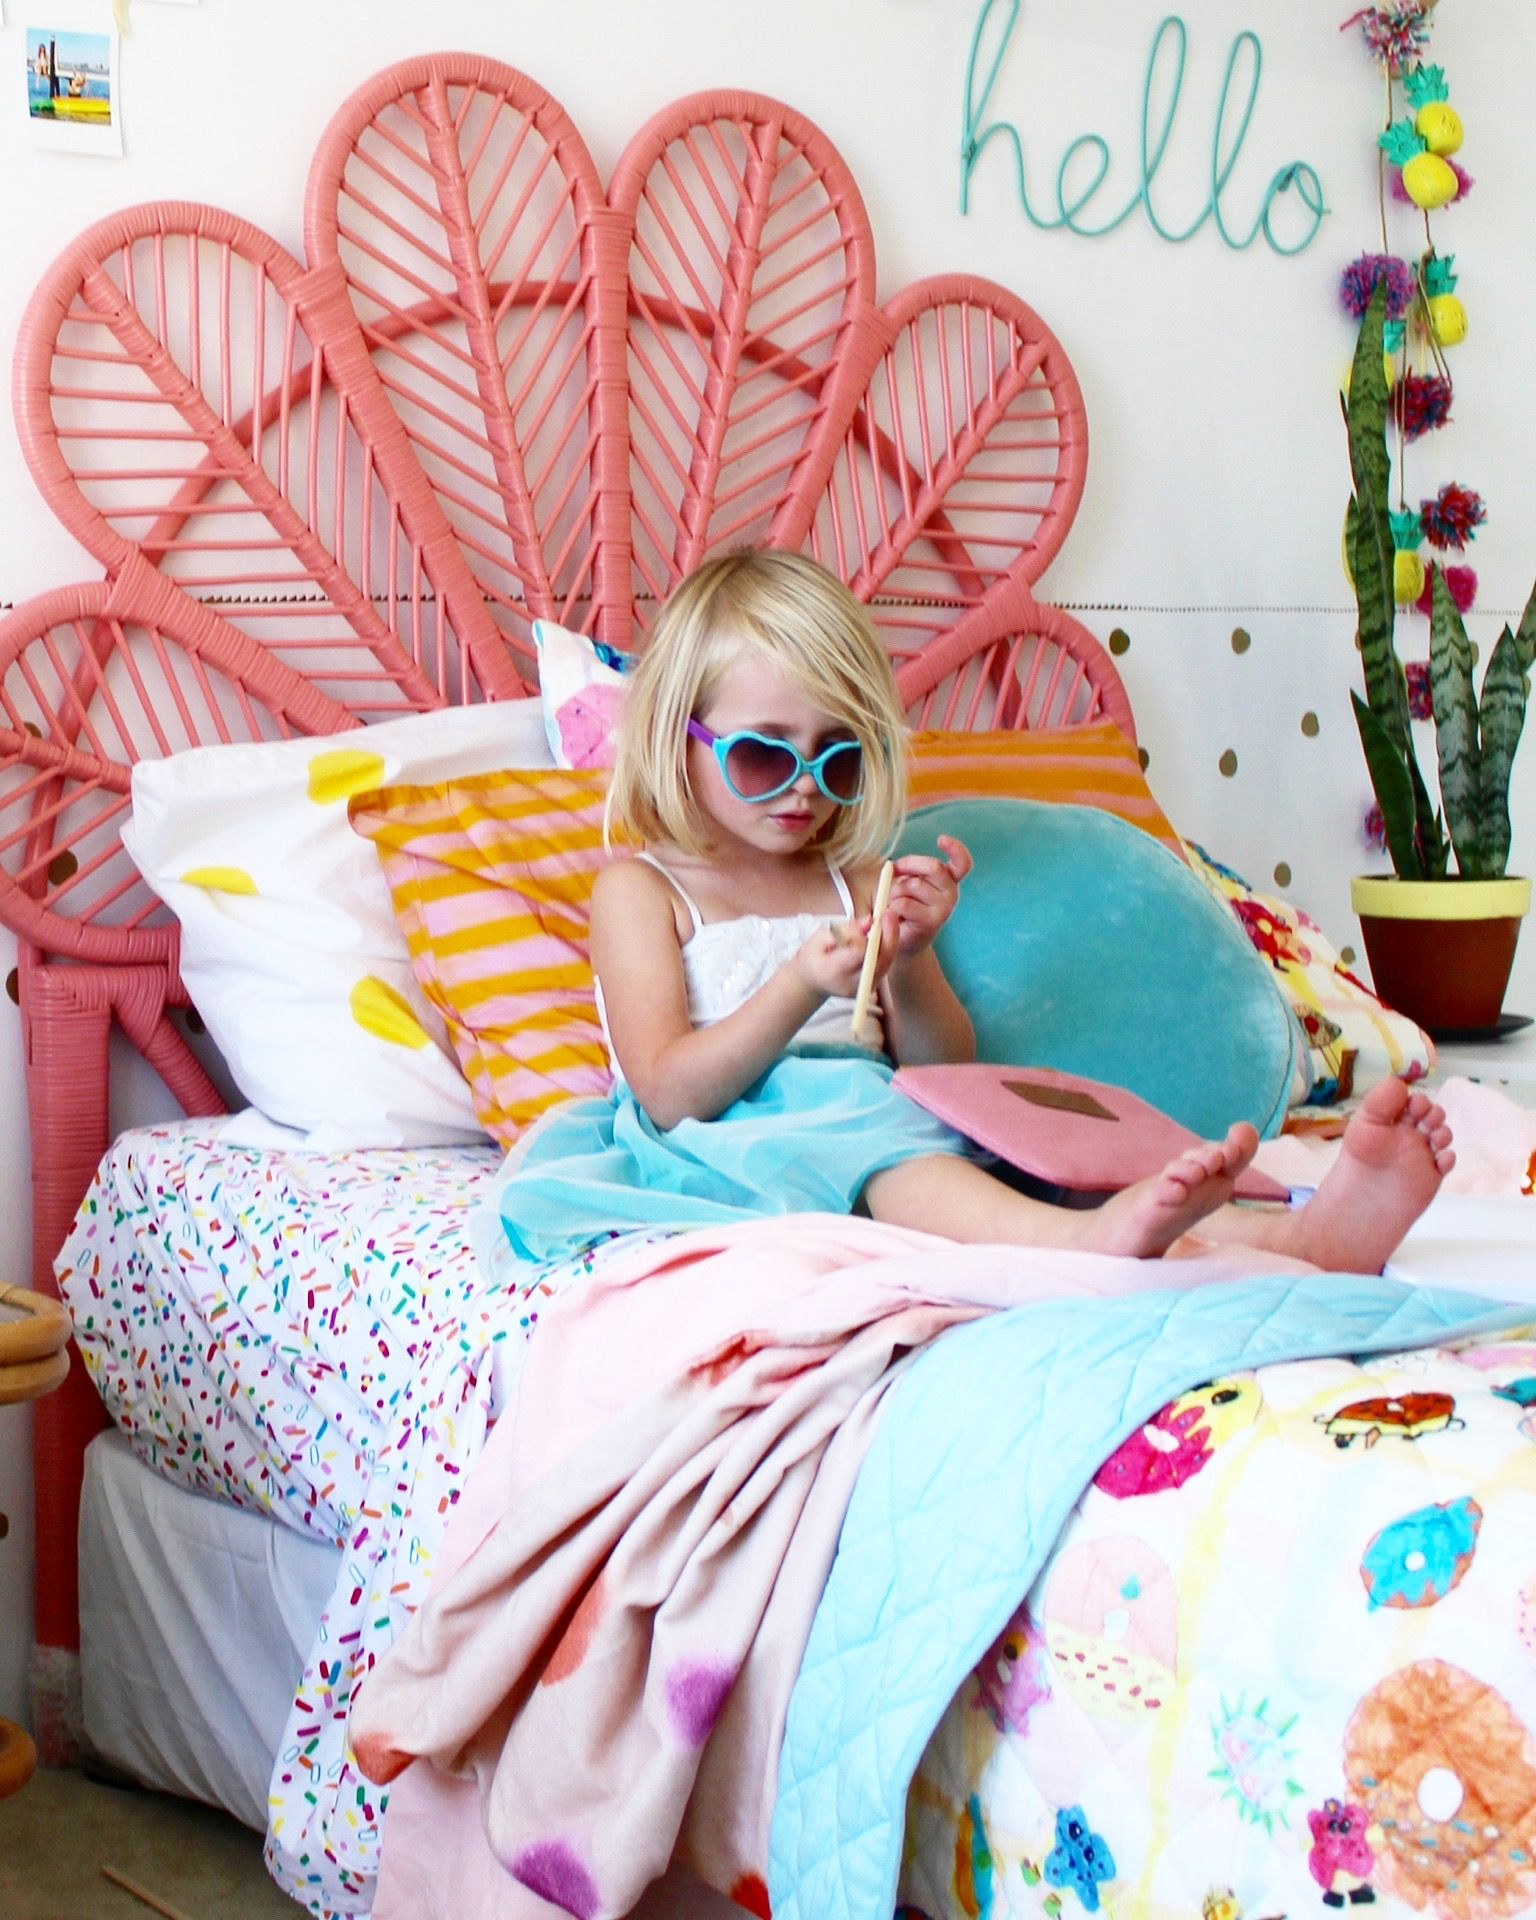 mini makeover time - boho style | Girl room, Girls bedroom ... on Boho Bedroom Ideas On A Budget  id=44442